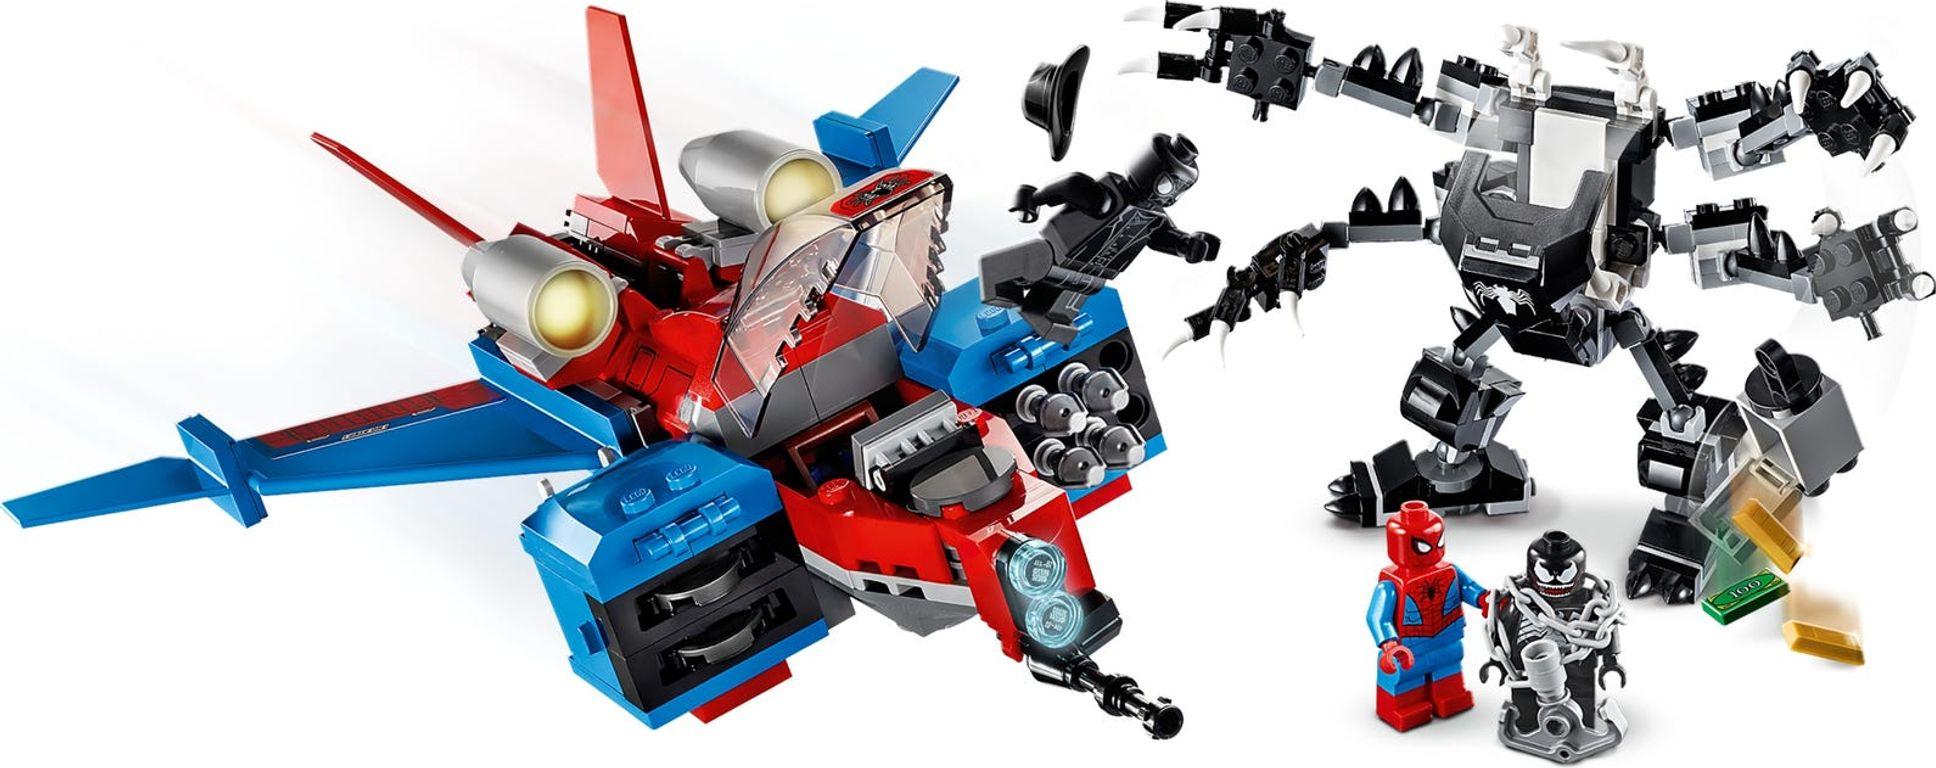 Spiderjet vs. Venom Mech components